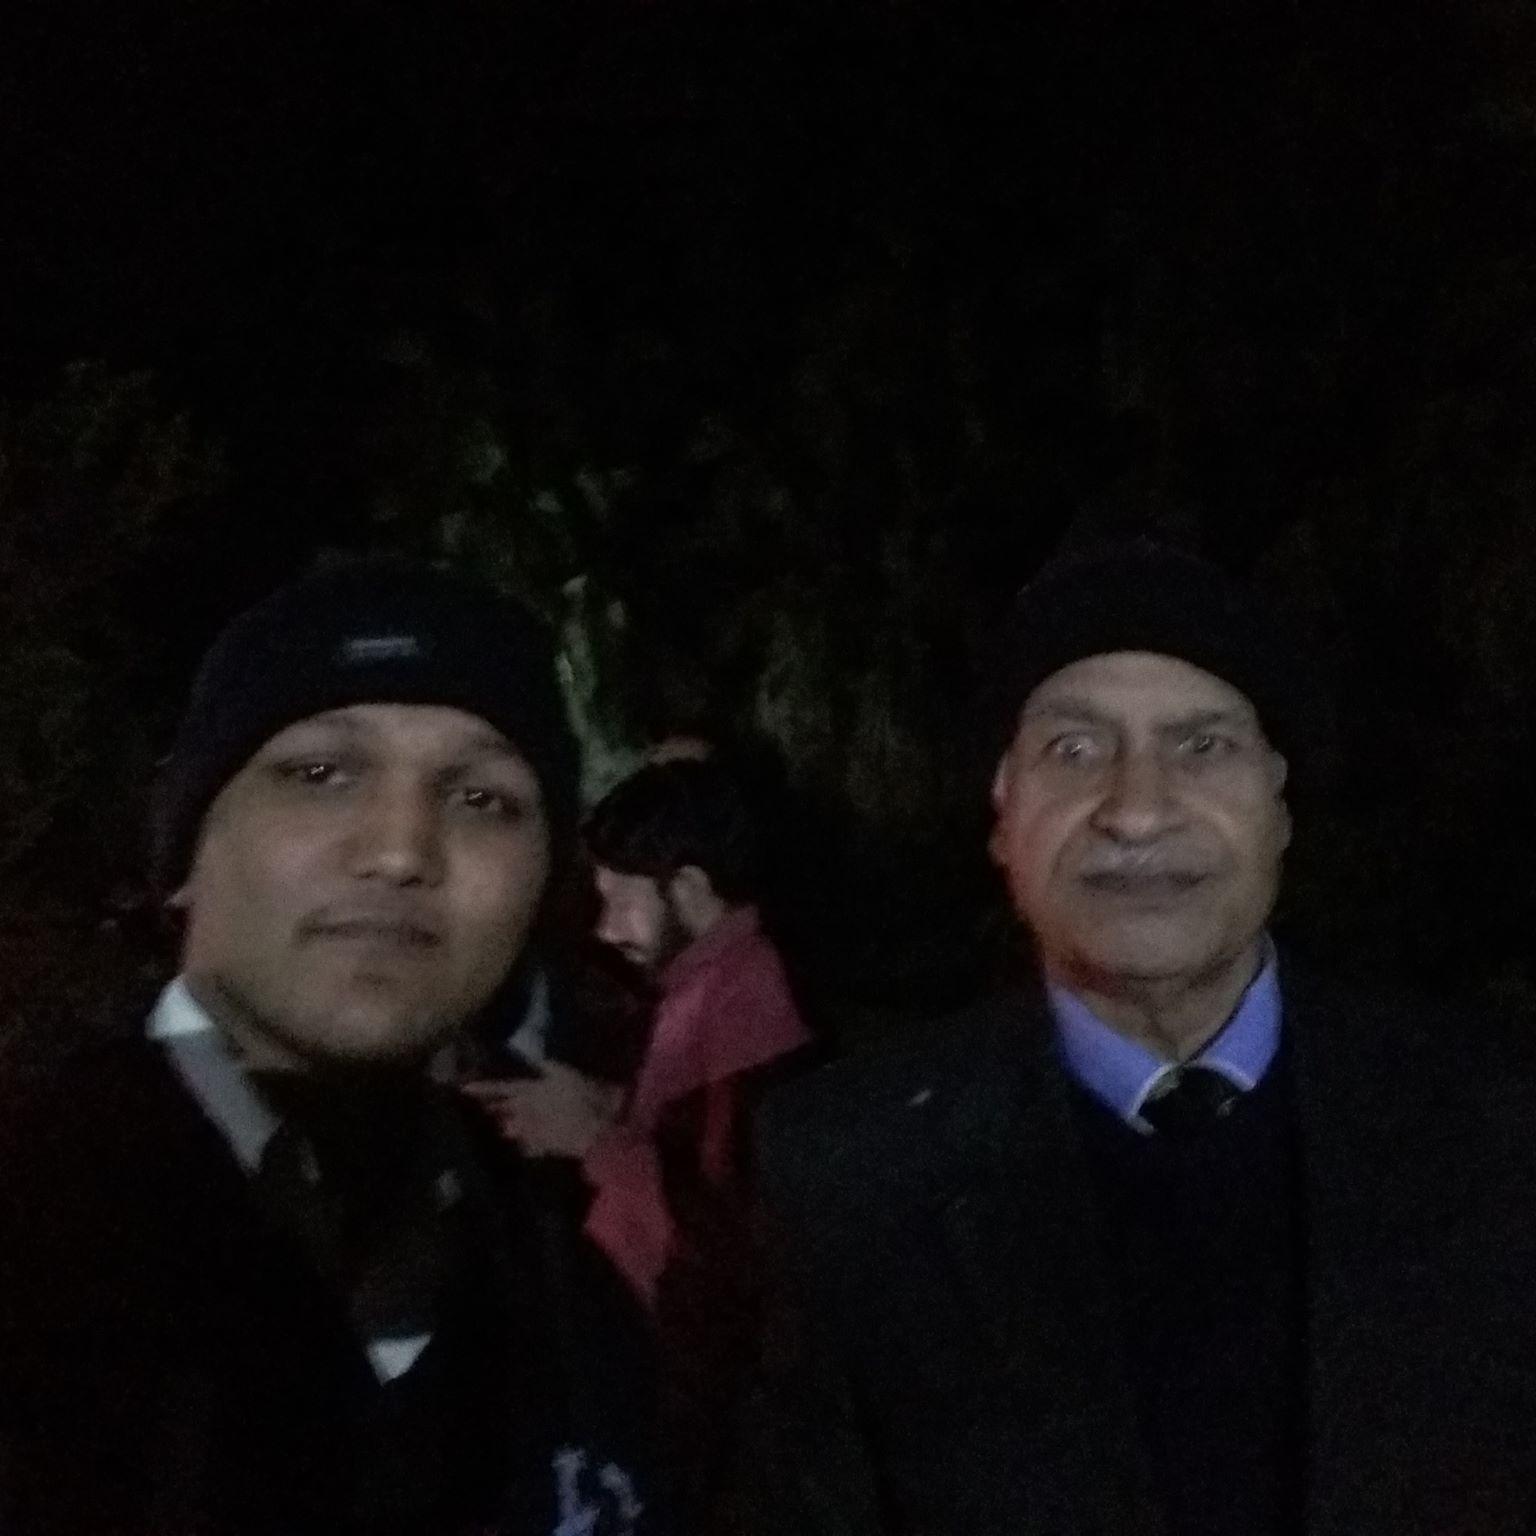 Late Prof. Yousaf Nayyer and Evangelist Sagar Gill